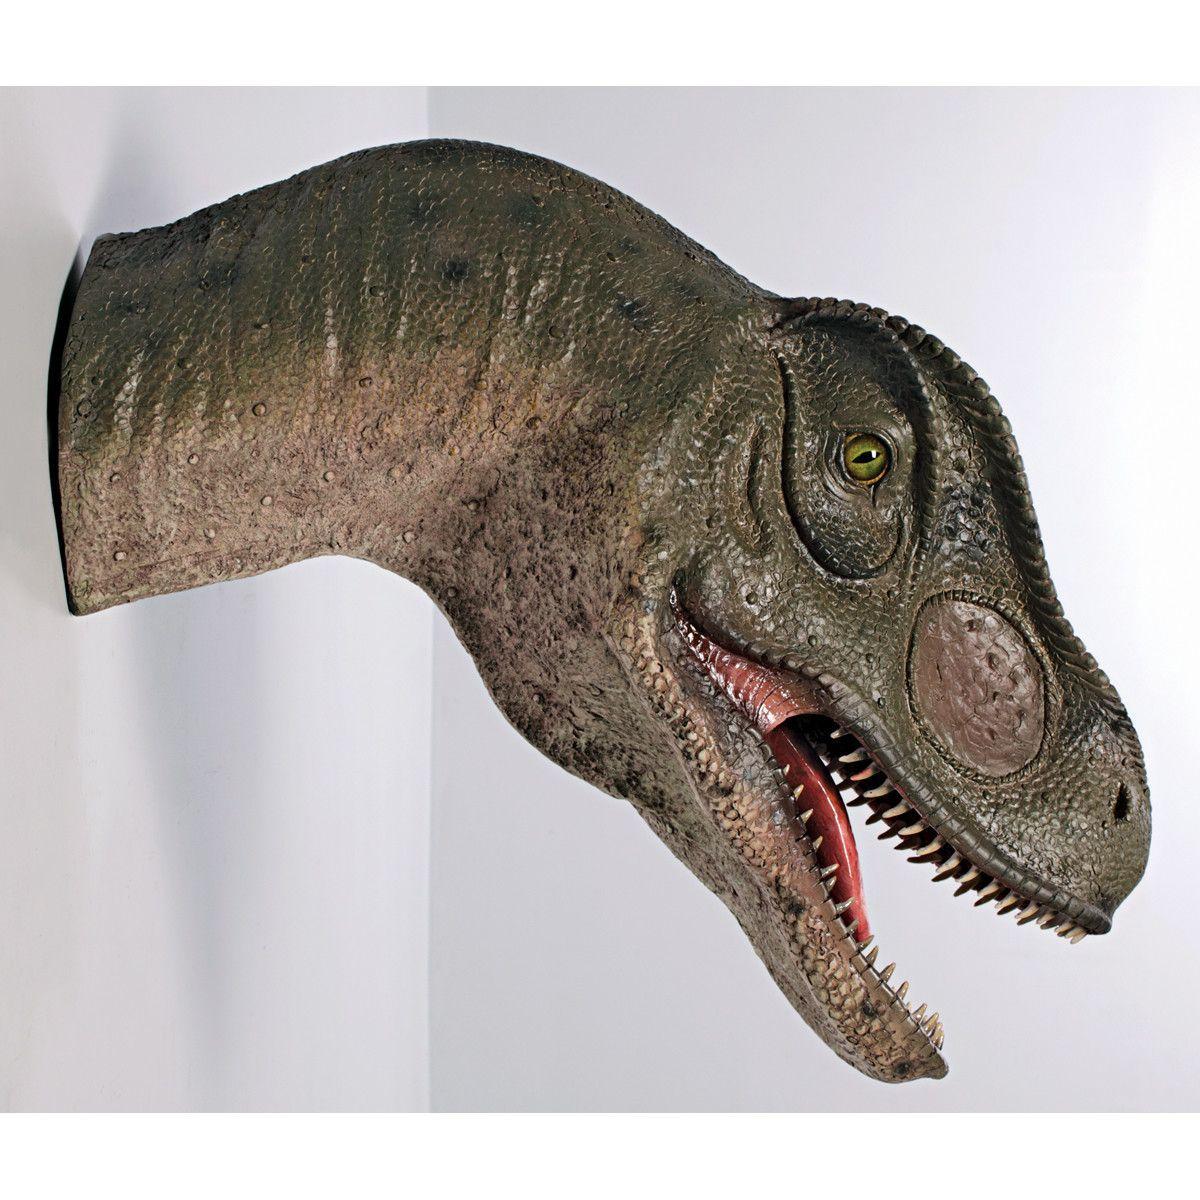 mouth open giant allosaurus dinosaur wall trophy garden statues mouthsdinosaurswallbenchesirondecor - Open Garden Decor